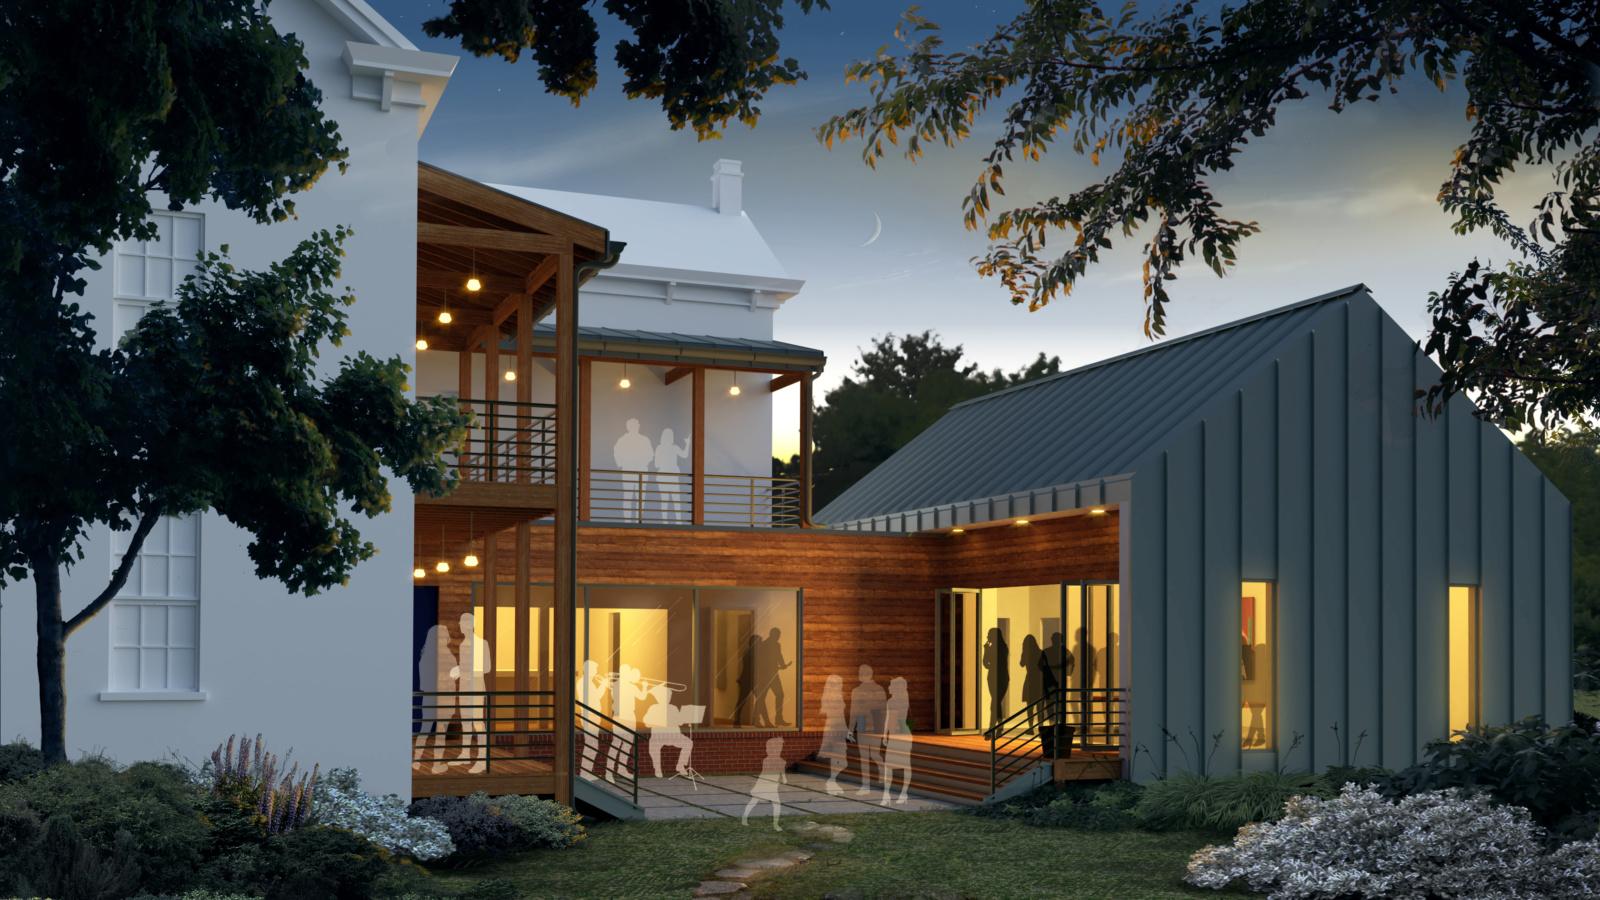 3d rendering of Trot Home